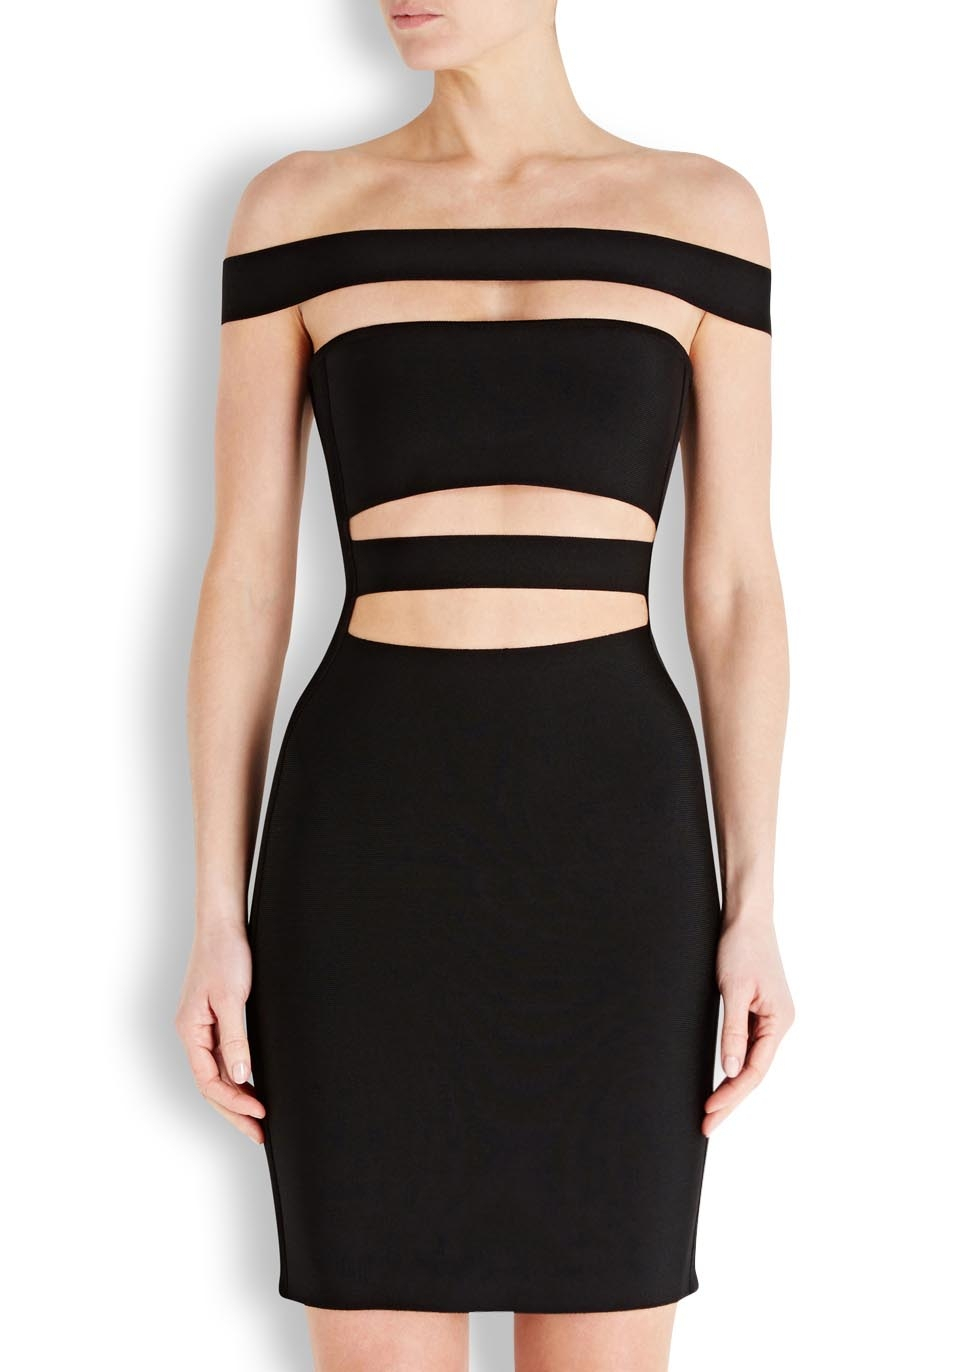 794b3d10 Balmain Black Cut-Out Off The Shoulder Dress in Black - Lyst